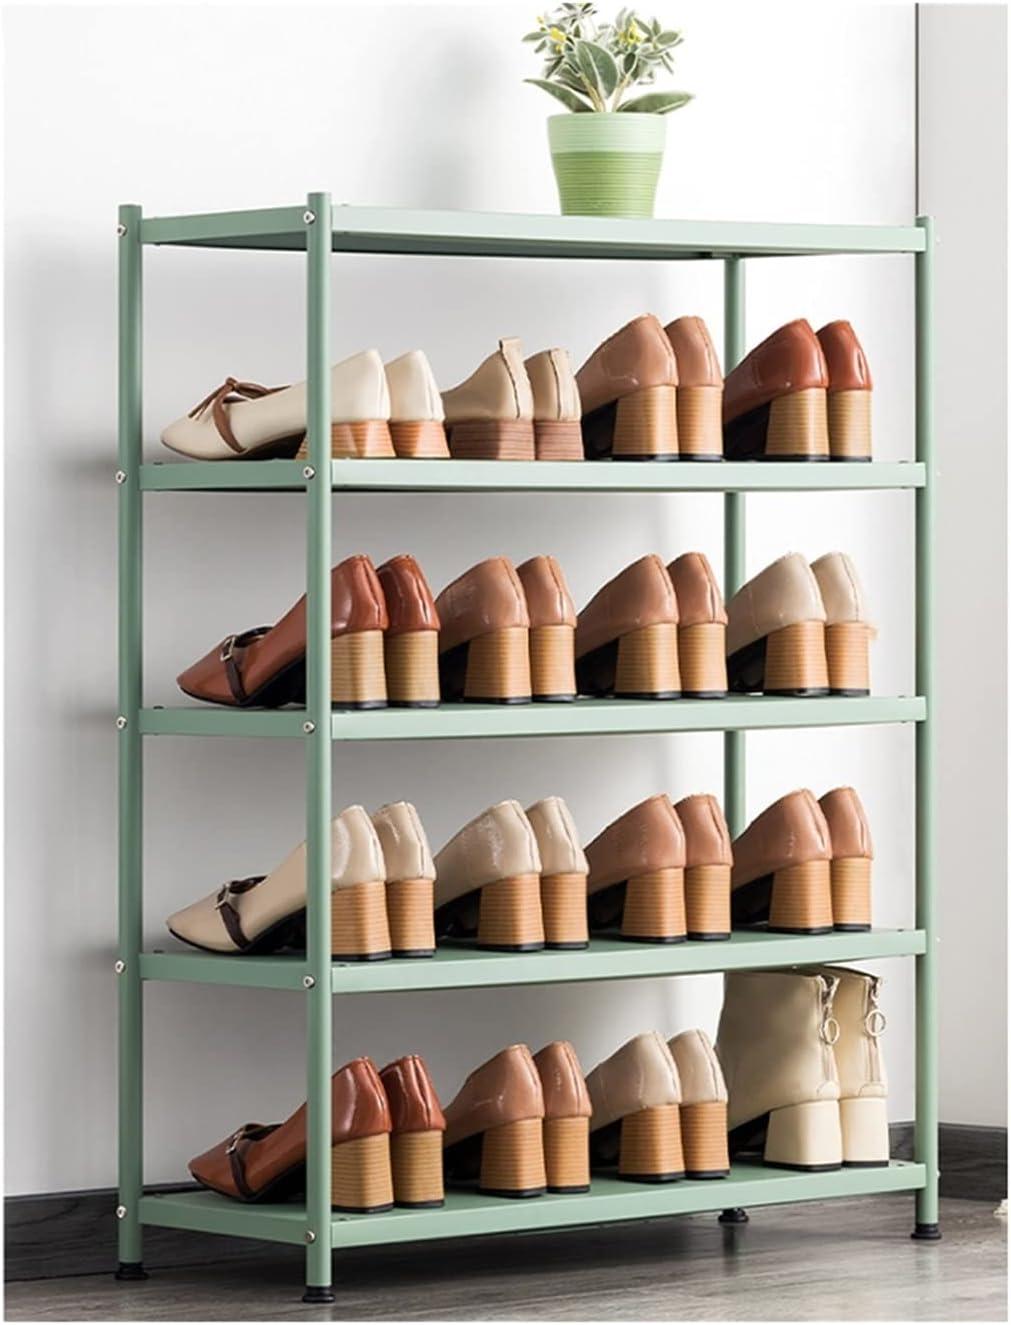 LOMJK Shoe Max 66% OFF Racks Metal Rack 5% OFF Freestanding To Economical